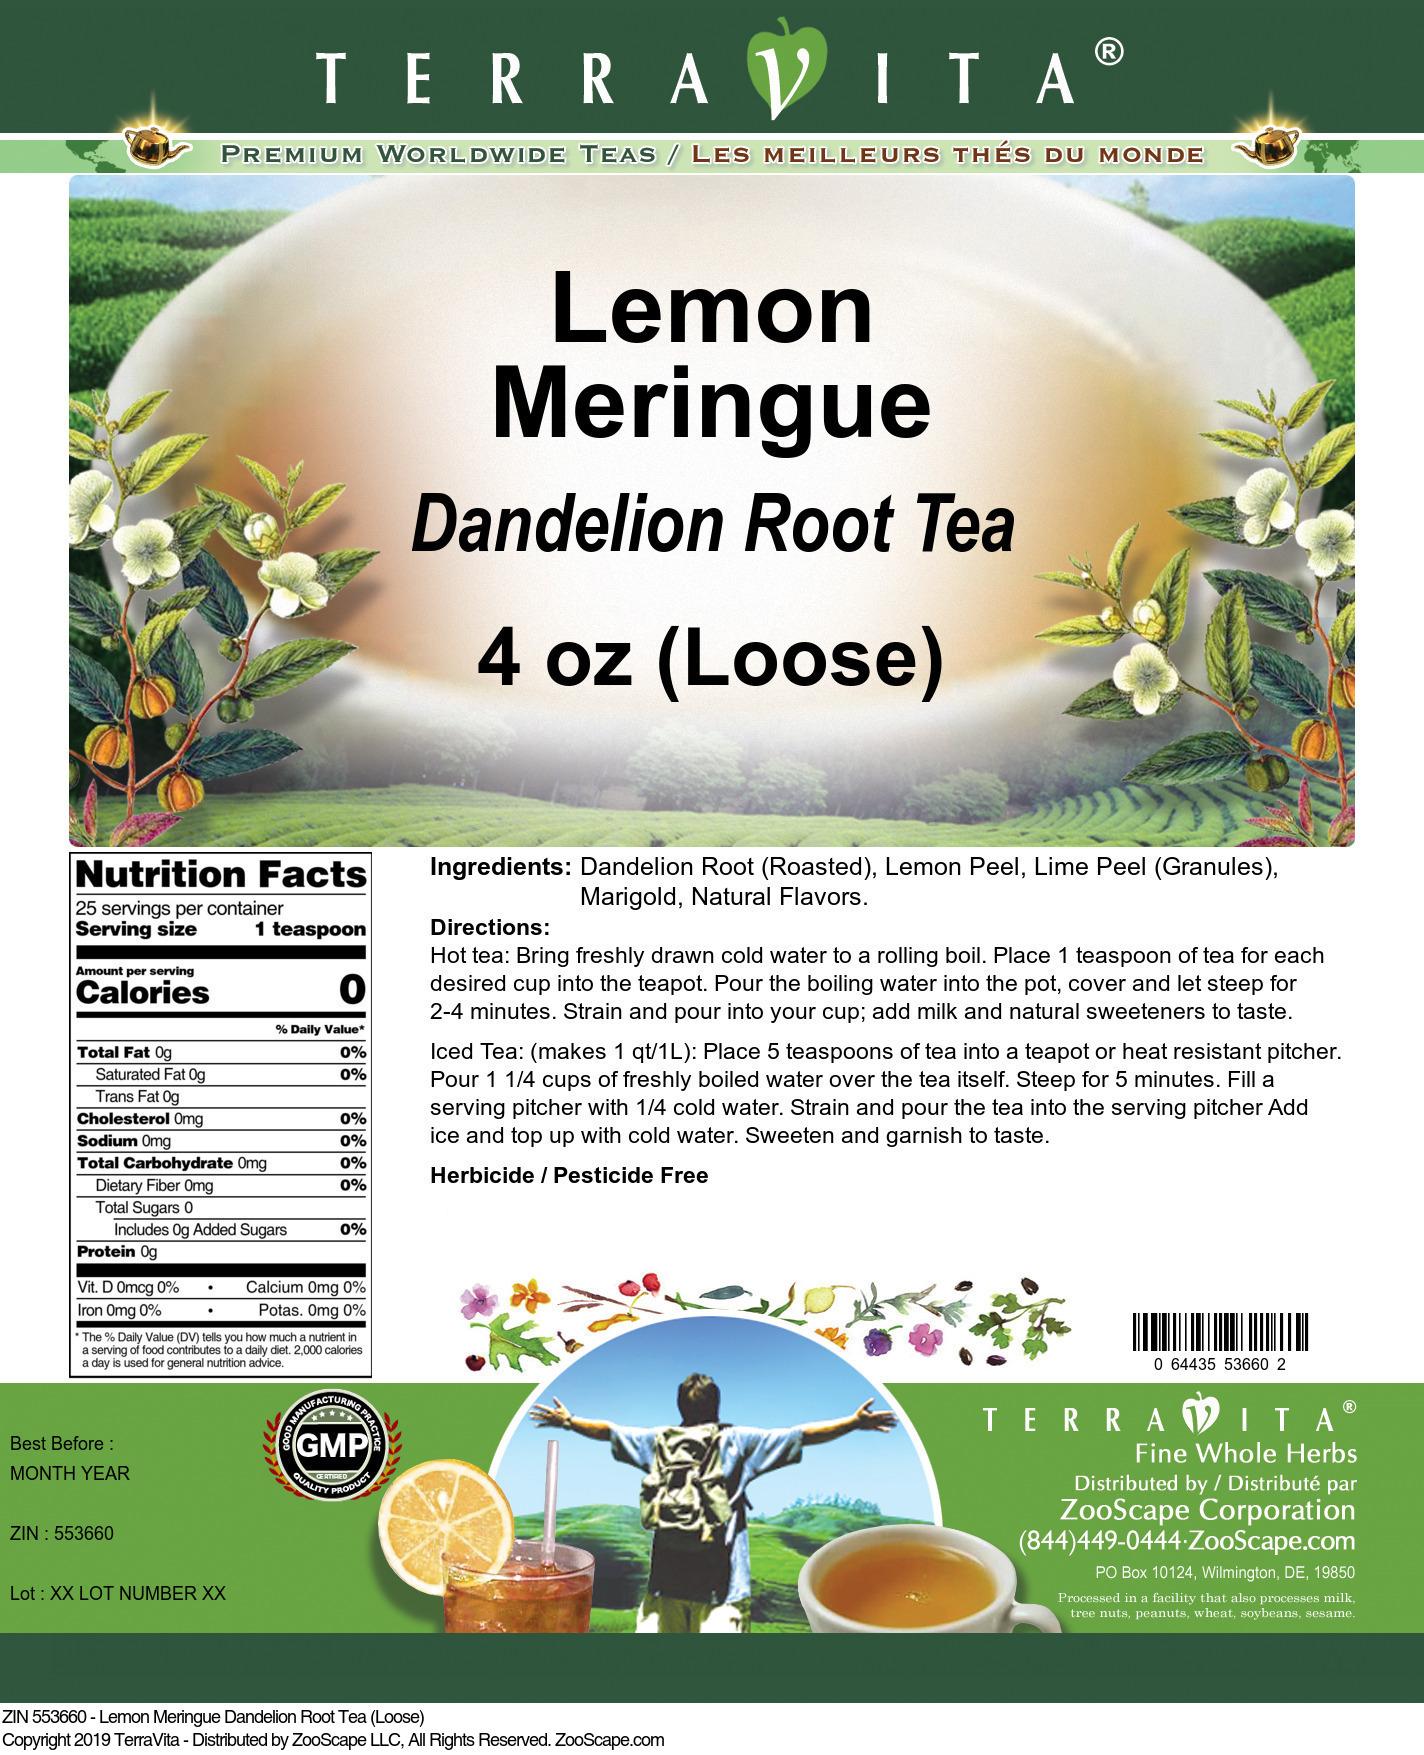 Lemon Meringue Dandelion Root Tea (Loose)